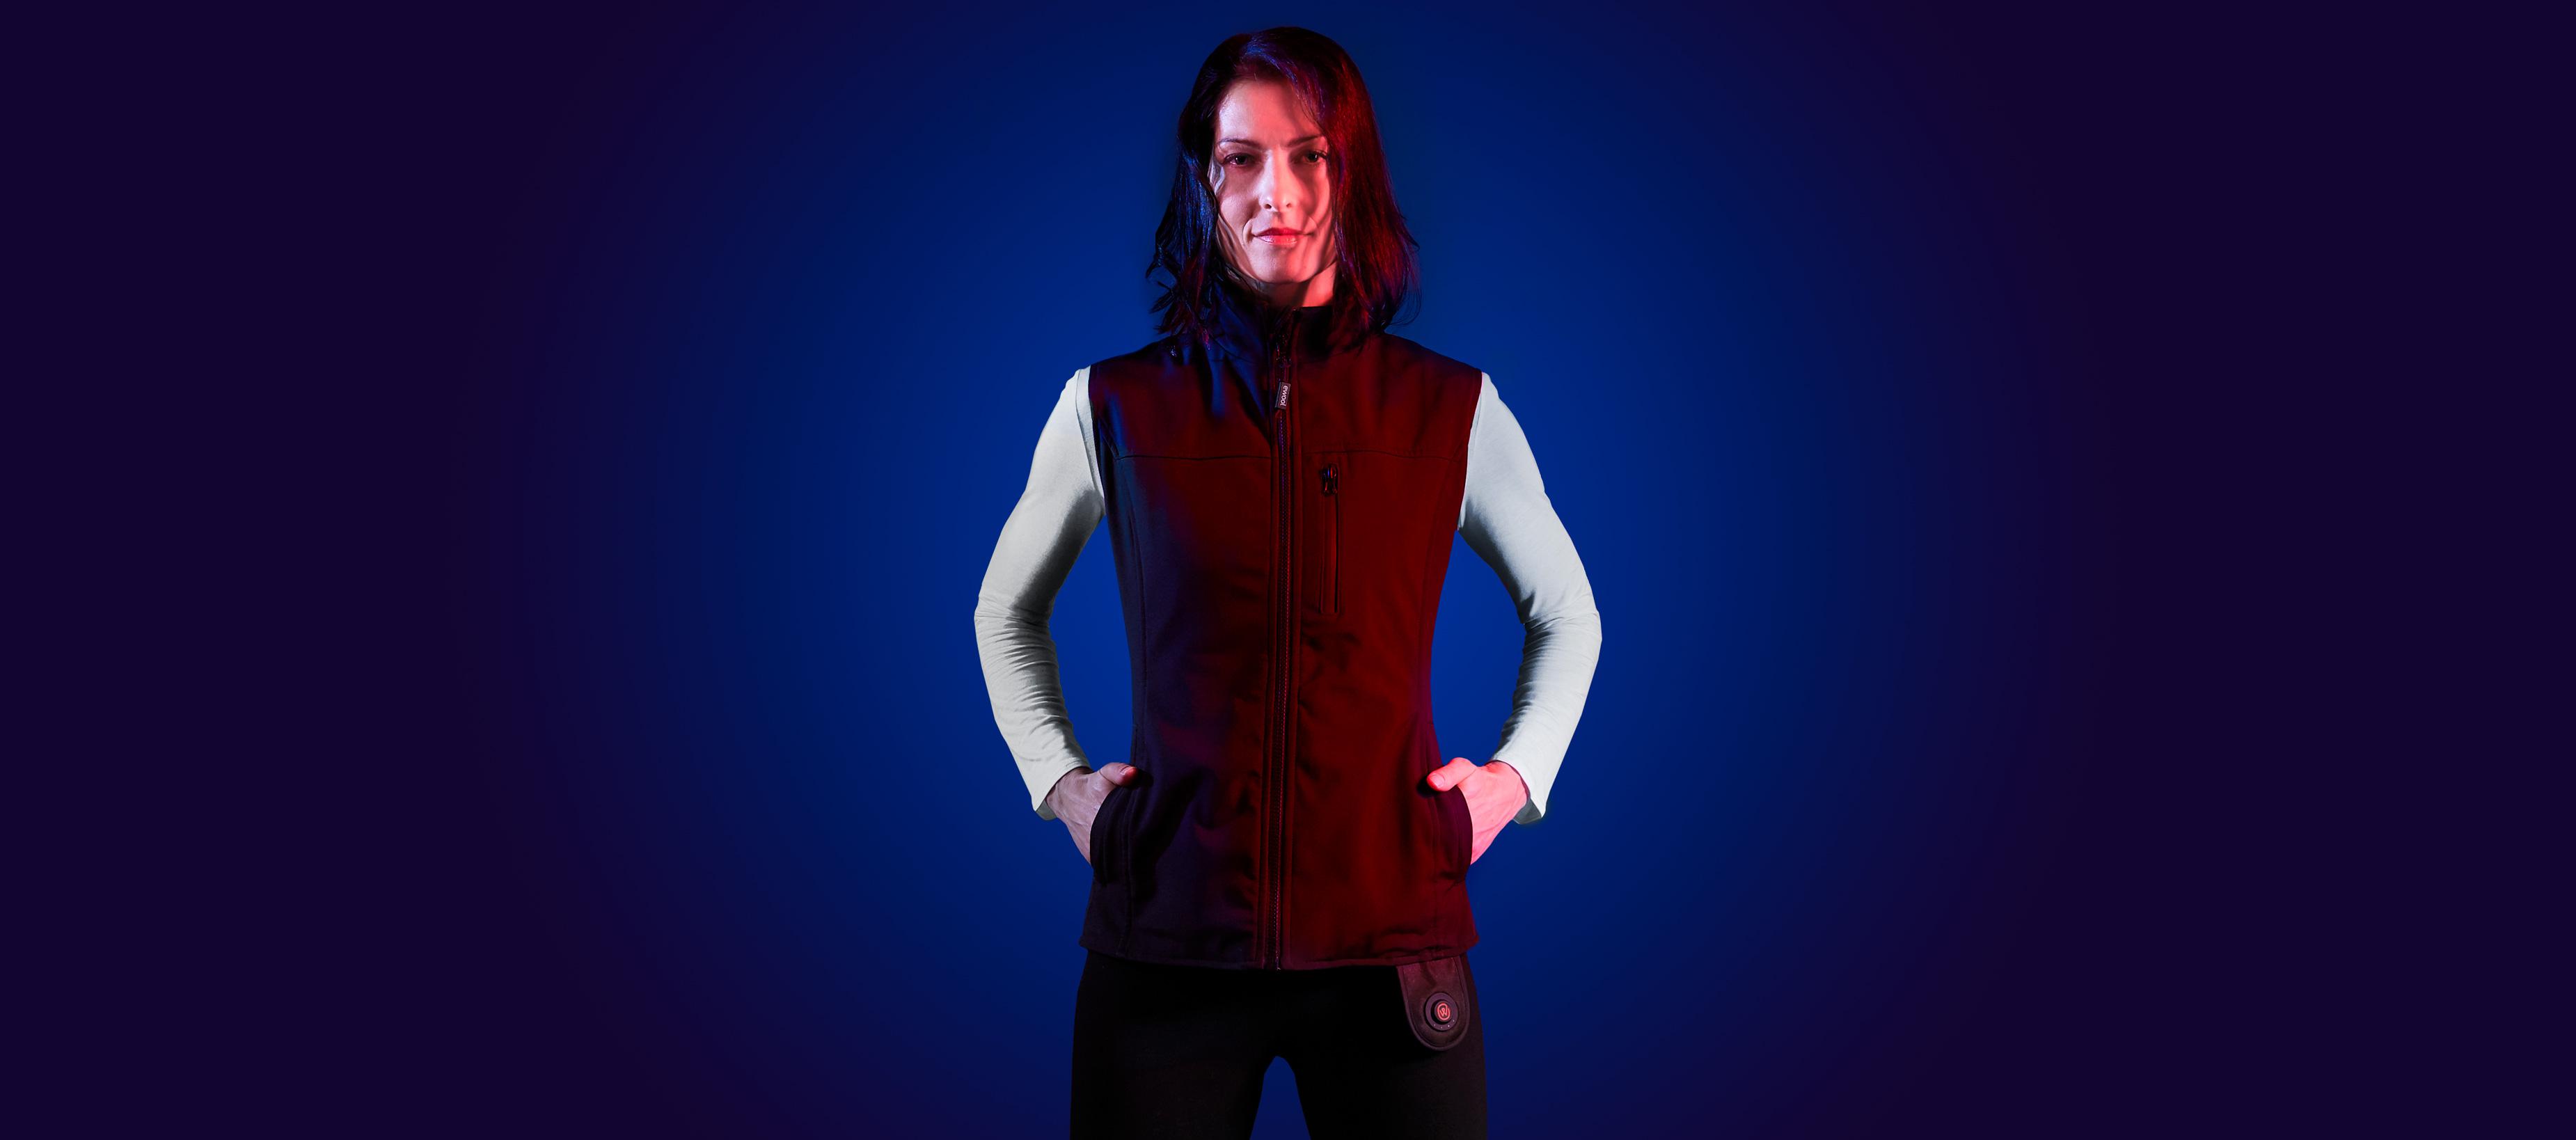 Femme confiante portant la veste chauffante ewool